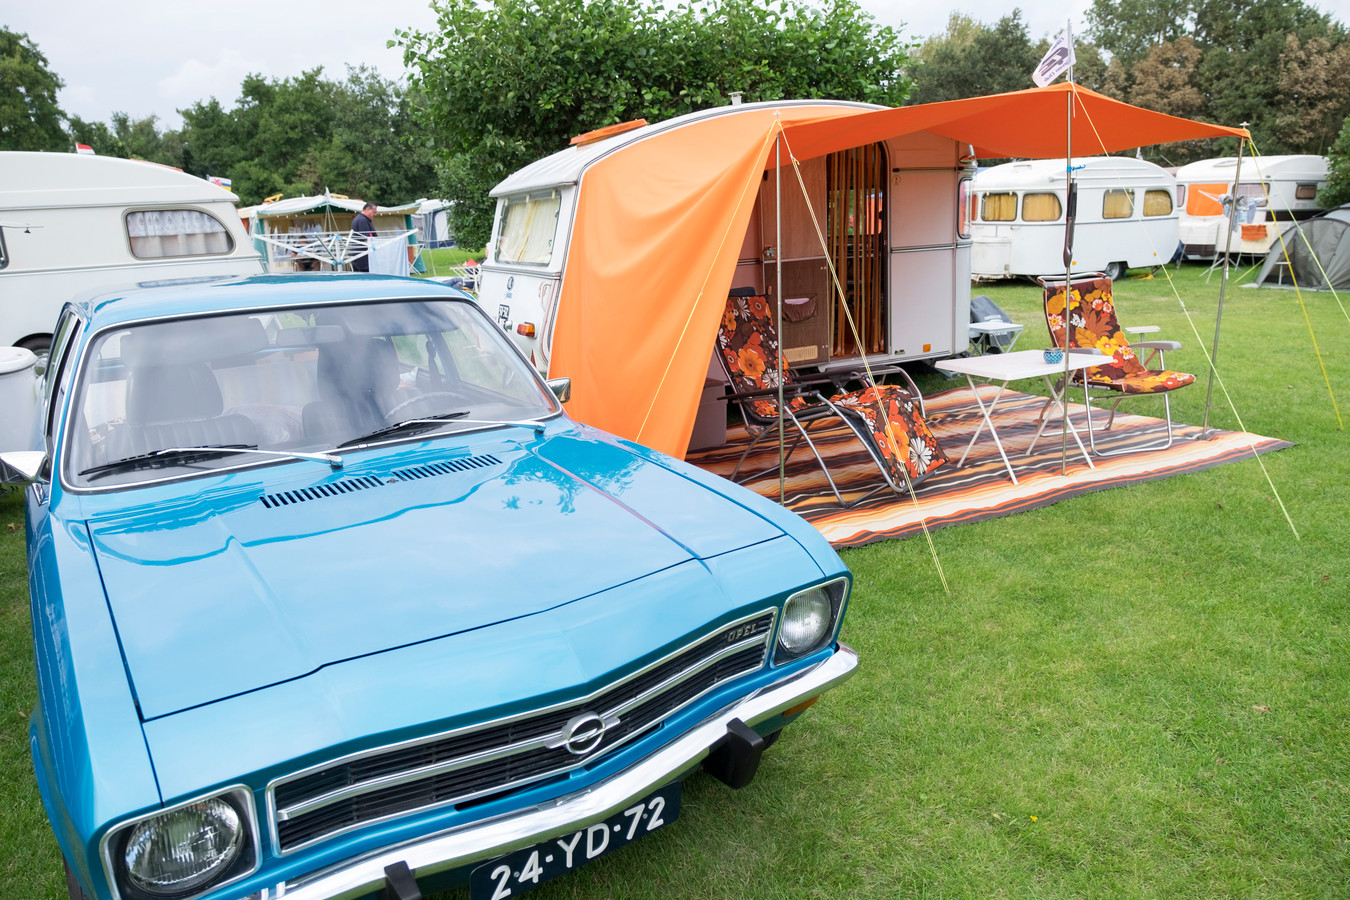 Camping Duinhoeve in Burgh-Haamstede.